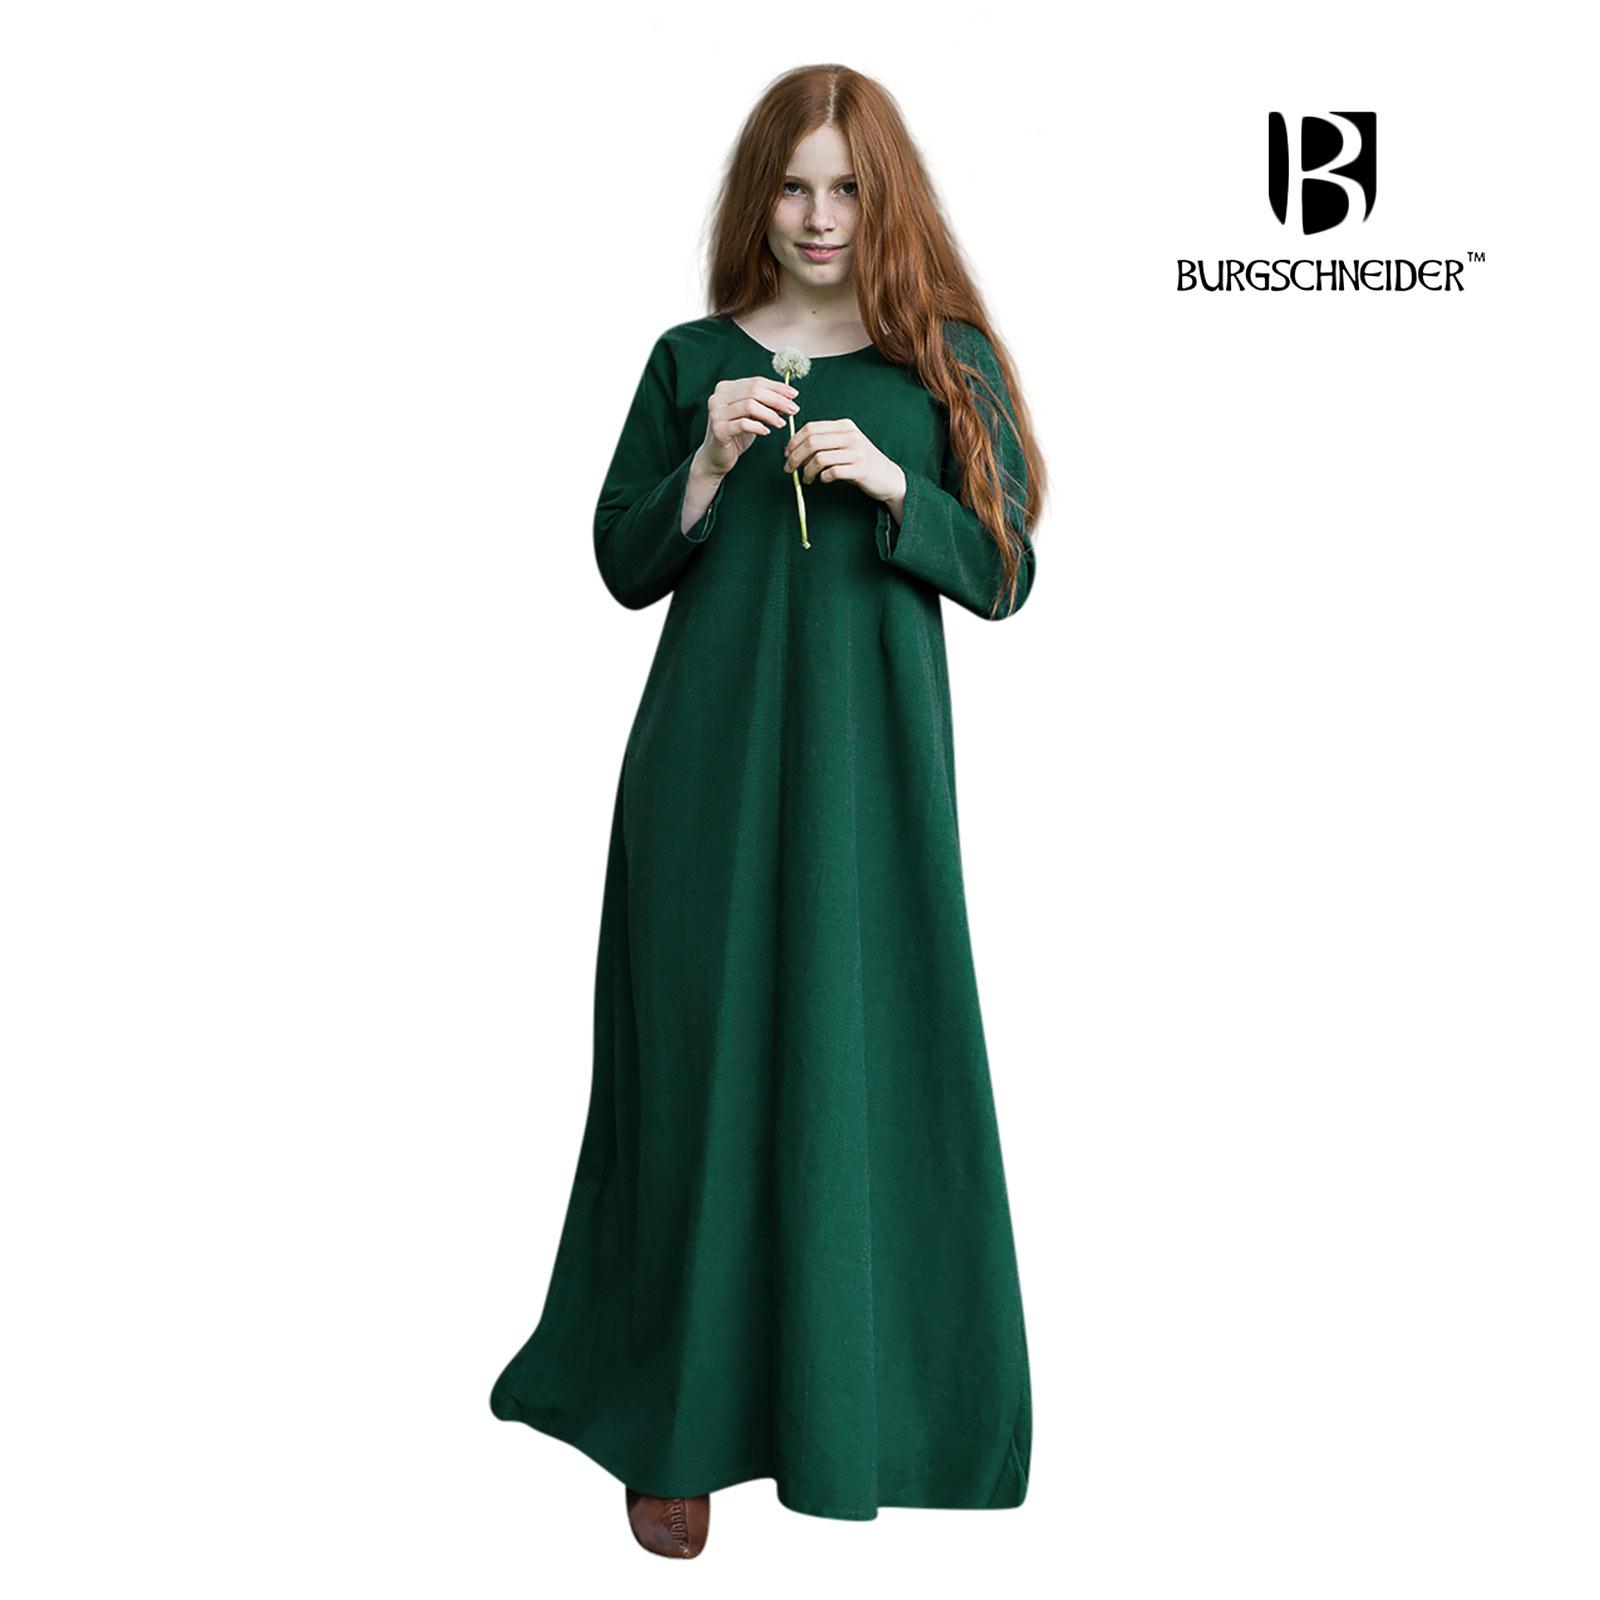 Mittelalter Unterkleid Freya grün